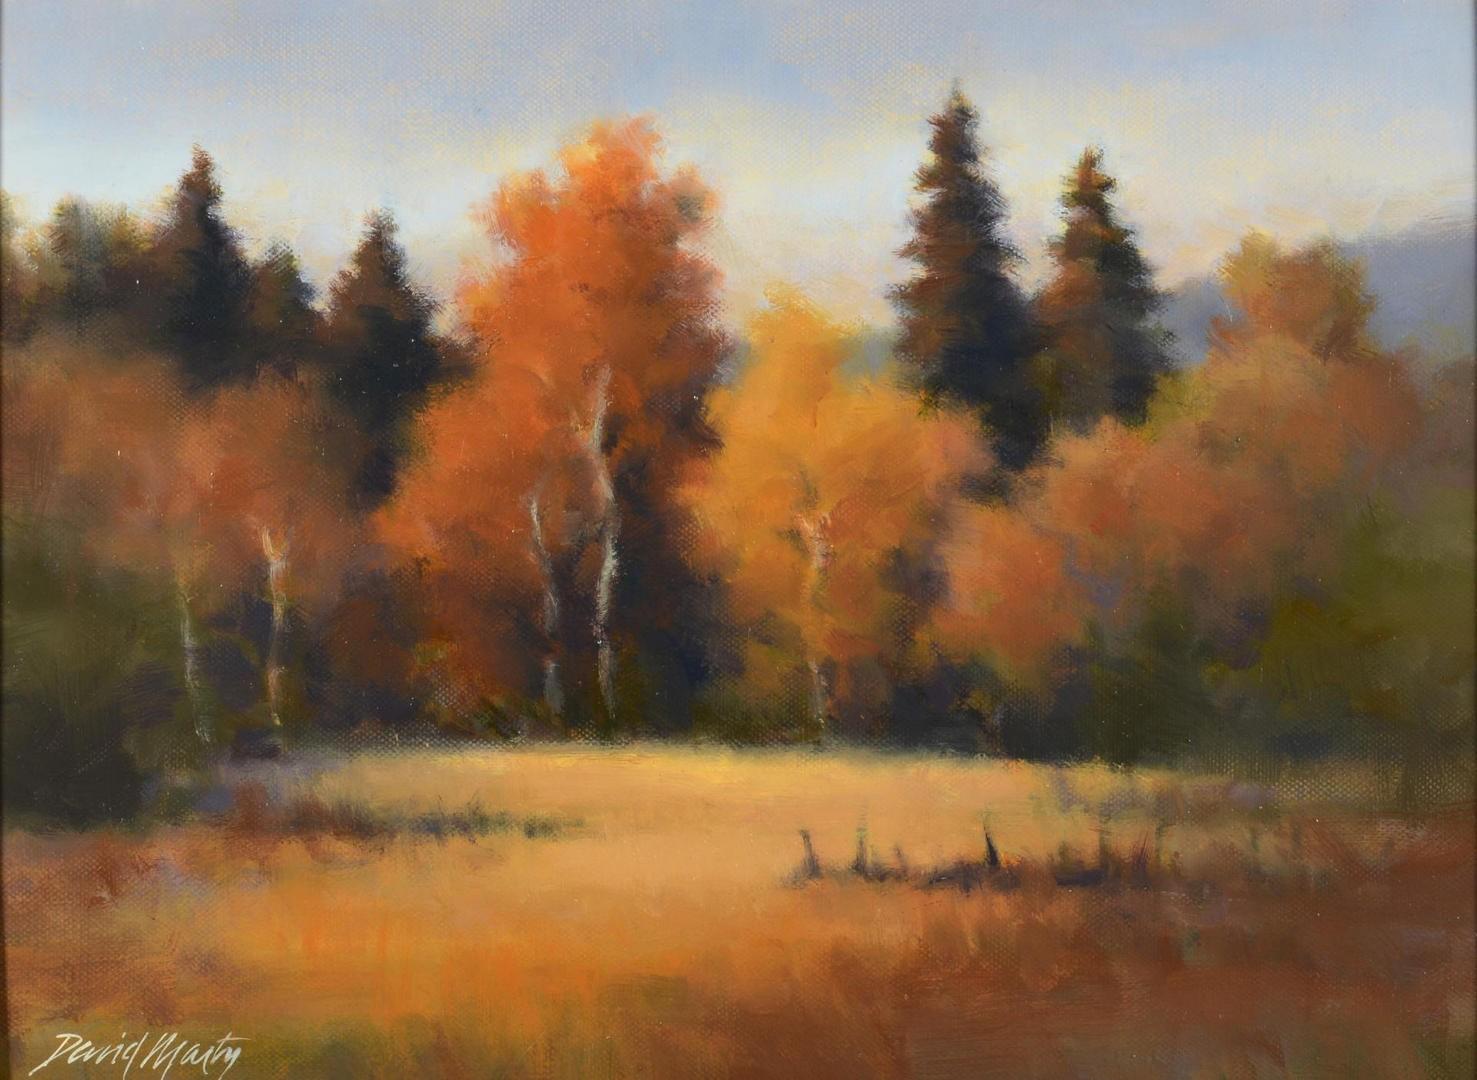 Lot 753: Autumn Glow by David Marty